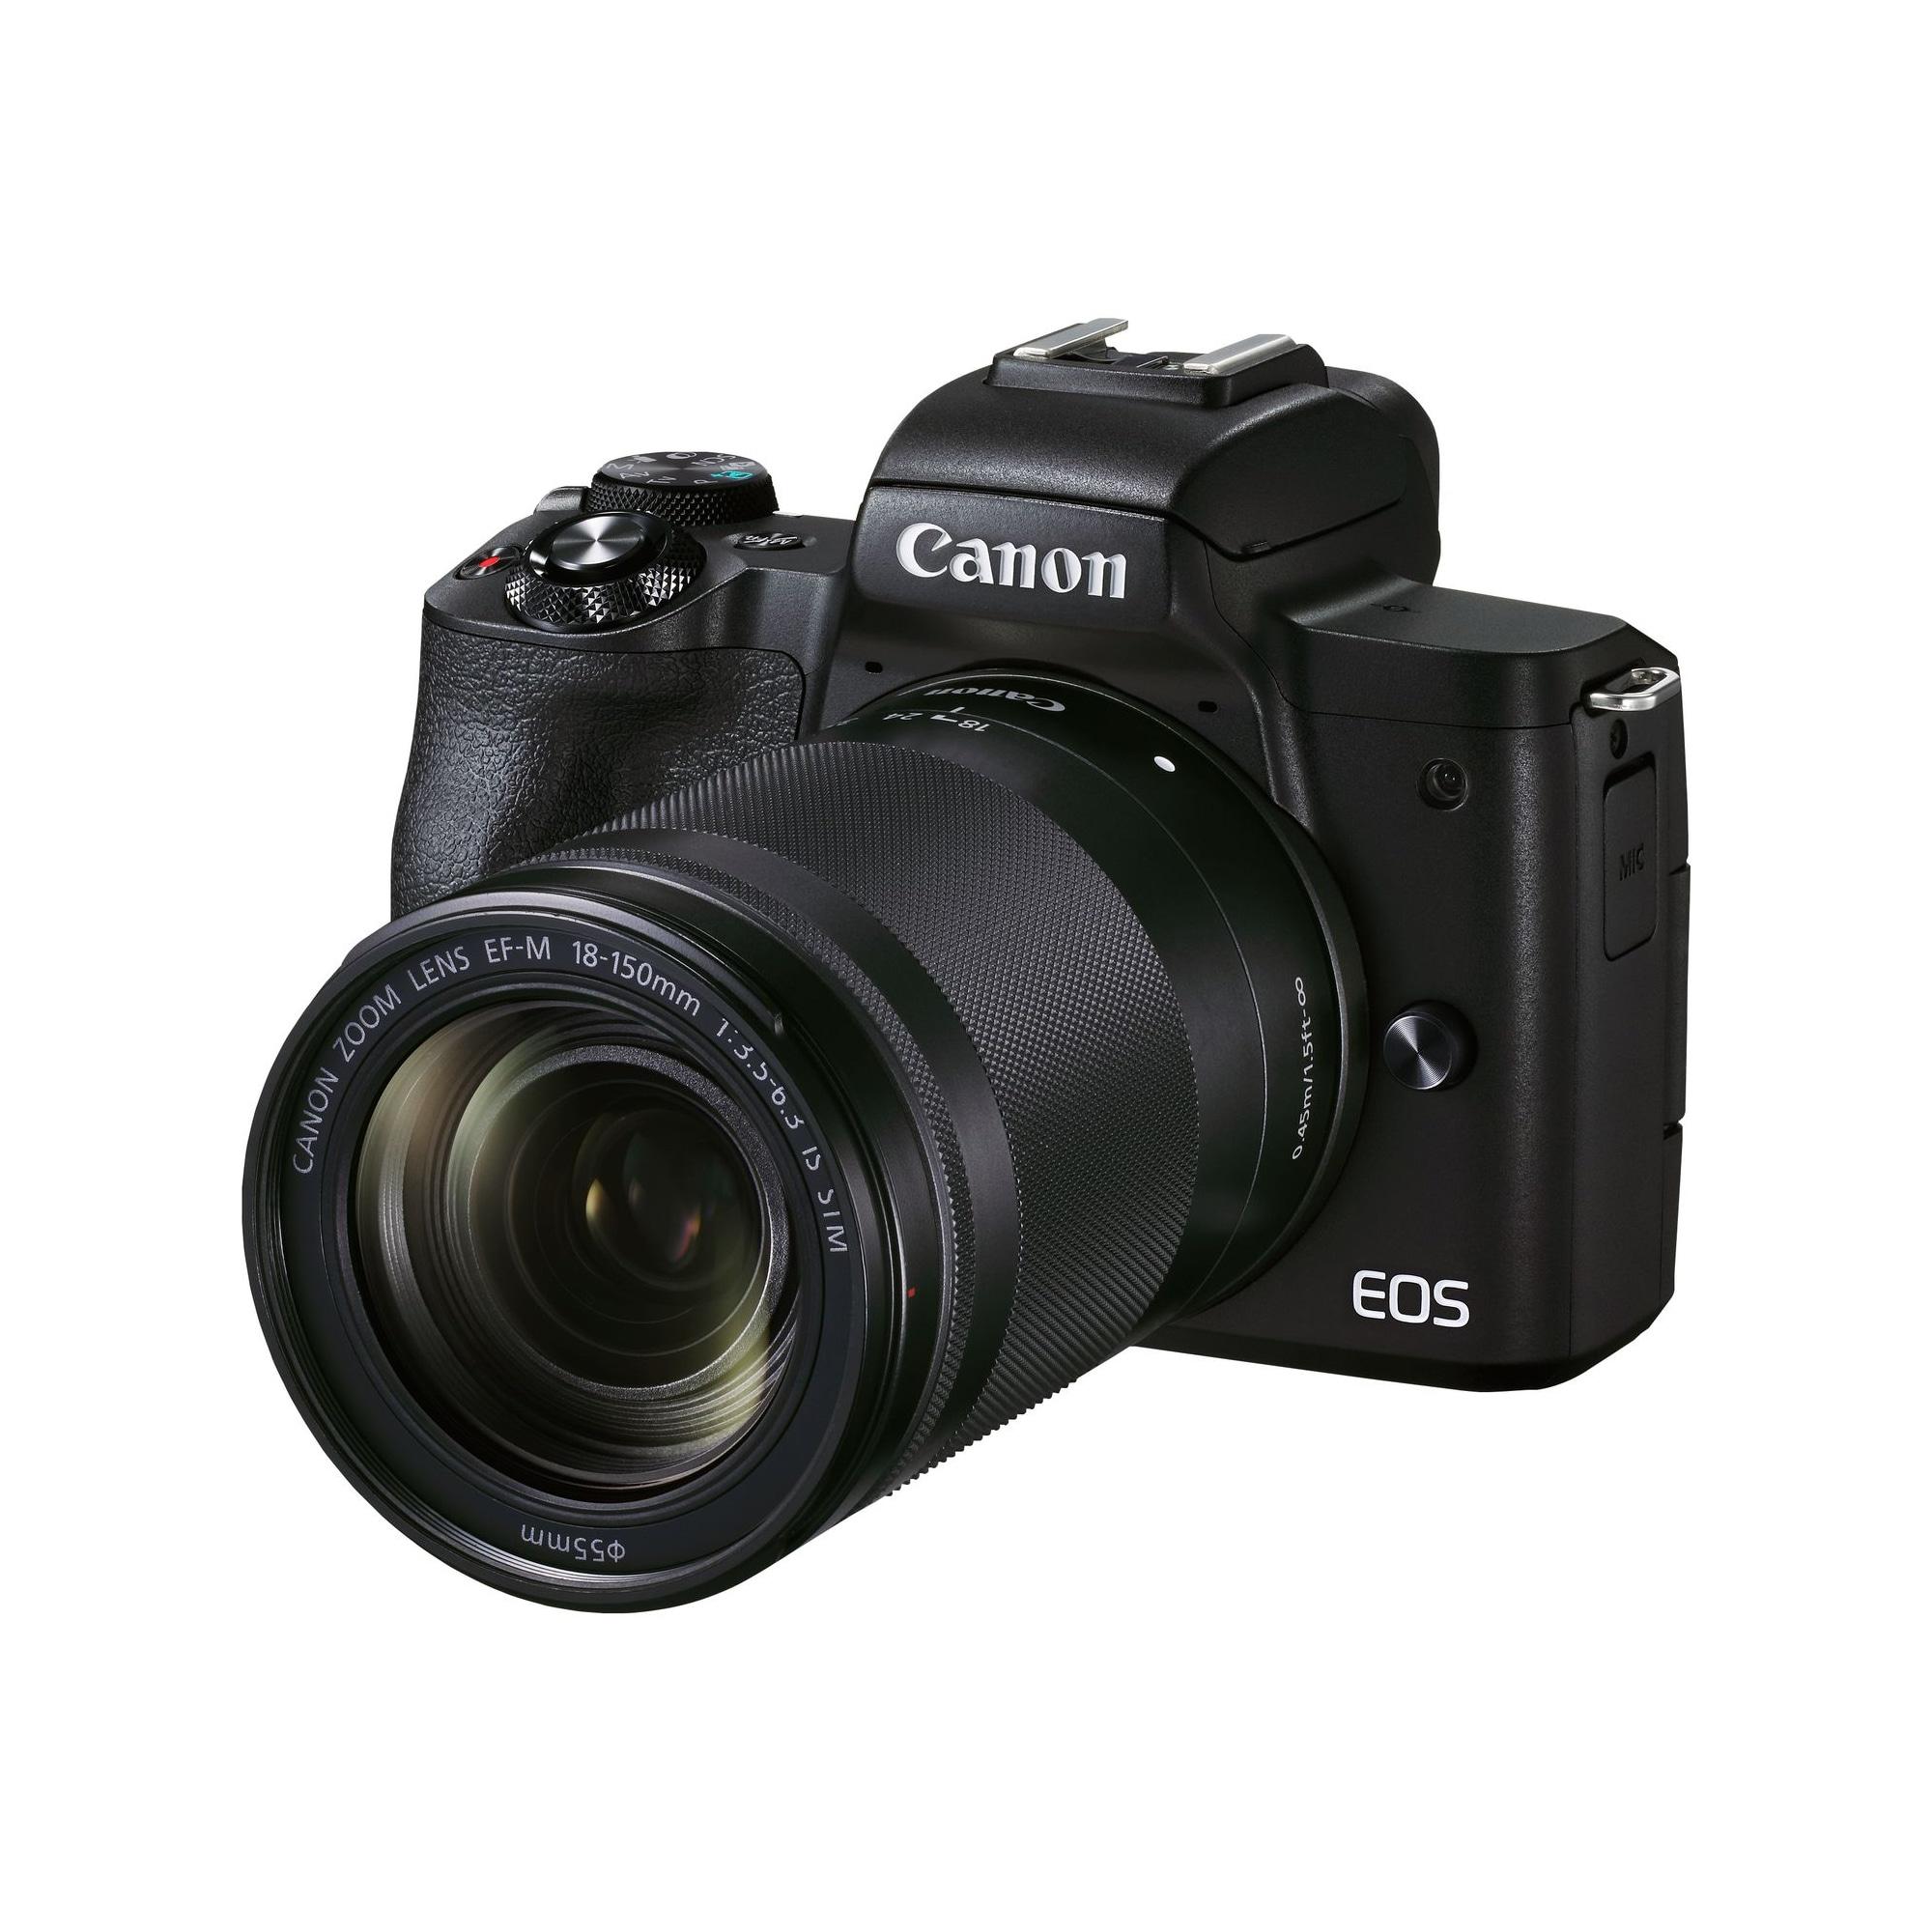 Canon EOS M50 Mark II svart kamerahus + EF-M 18-150/3,5-6,3 IS STM